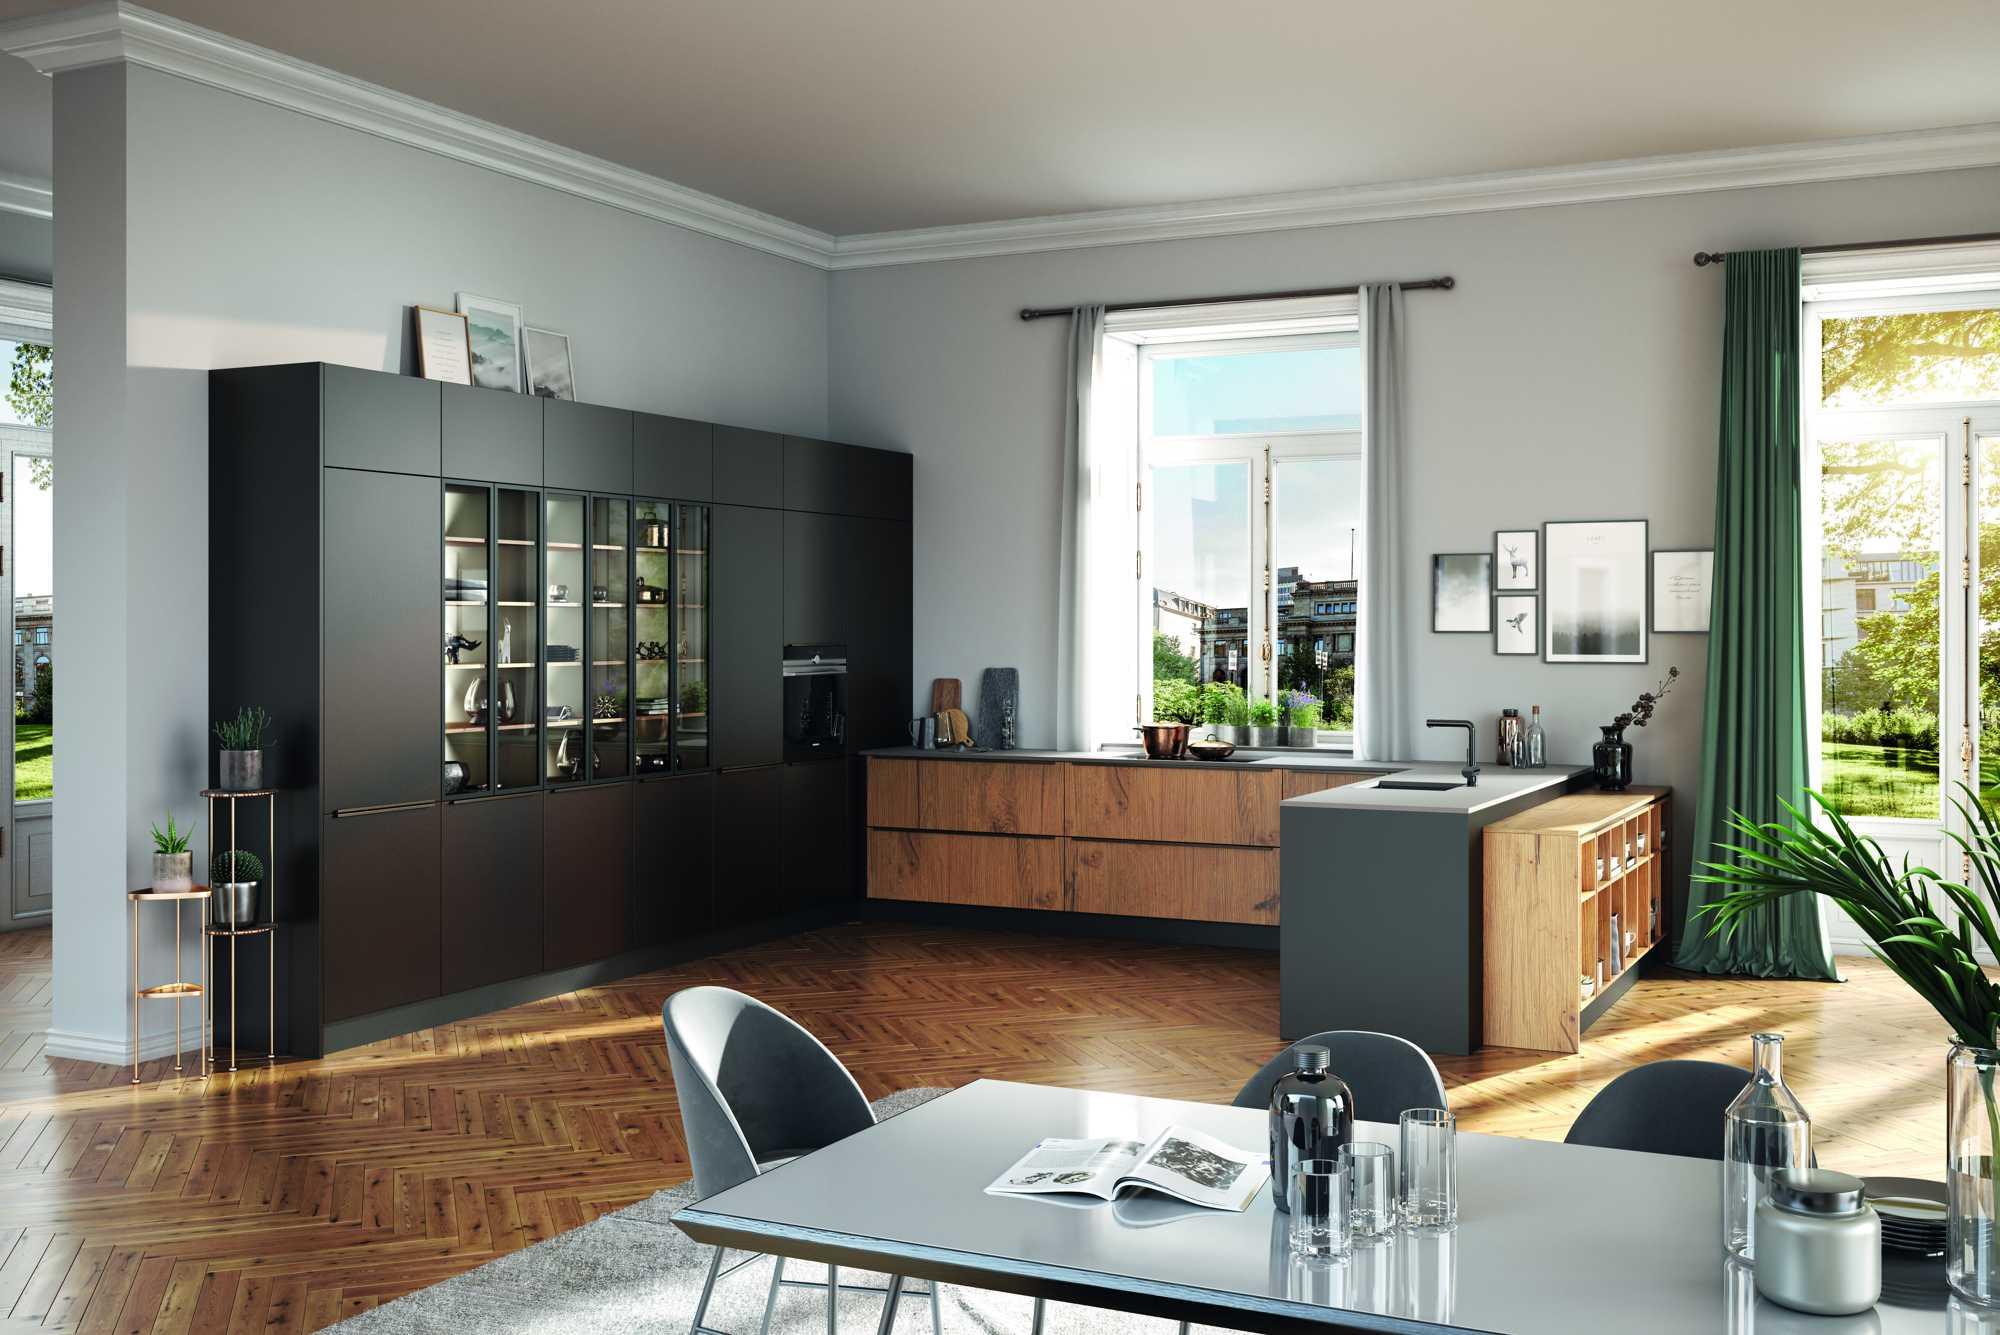 Open ZeroxAbbey Split Oak and Arabica Kitchen with peninsulaand industrial style glass doors